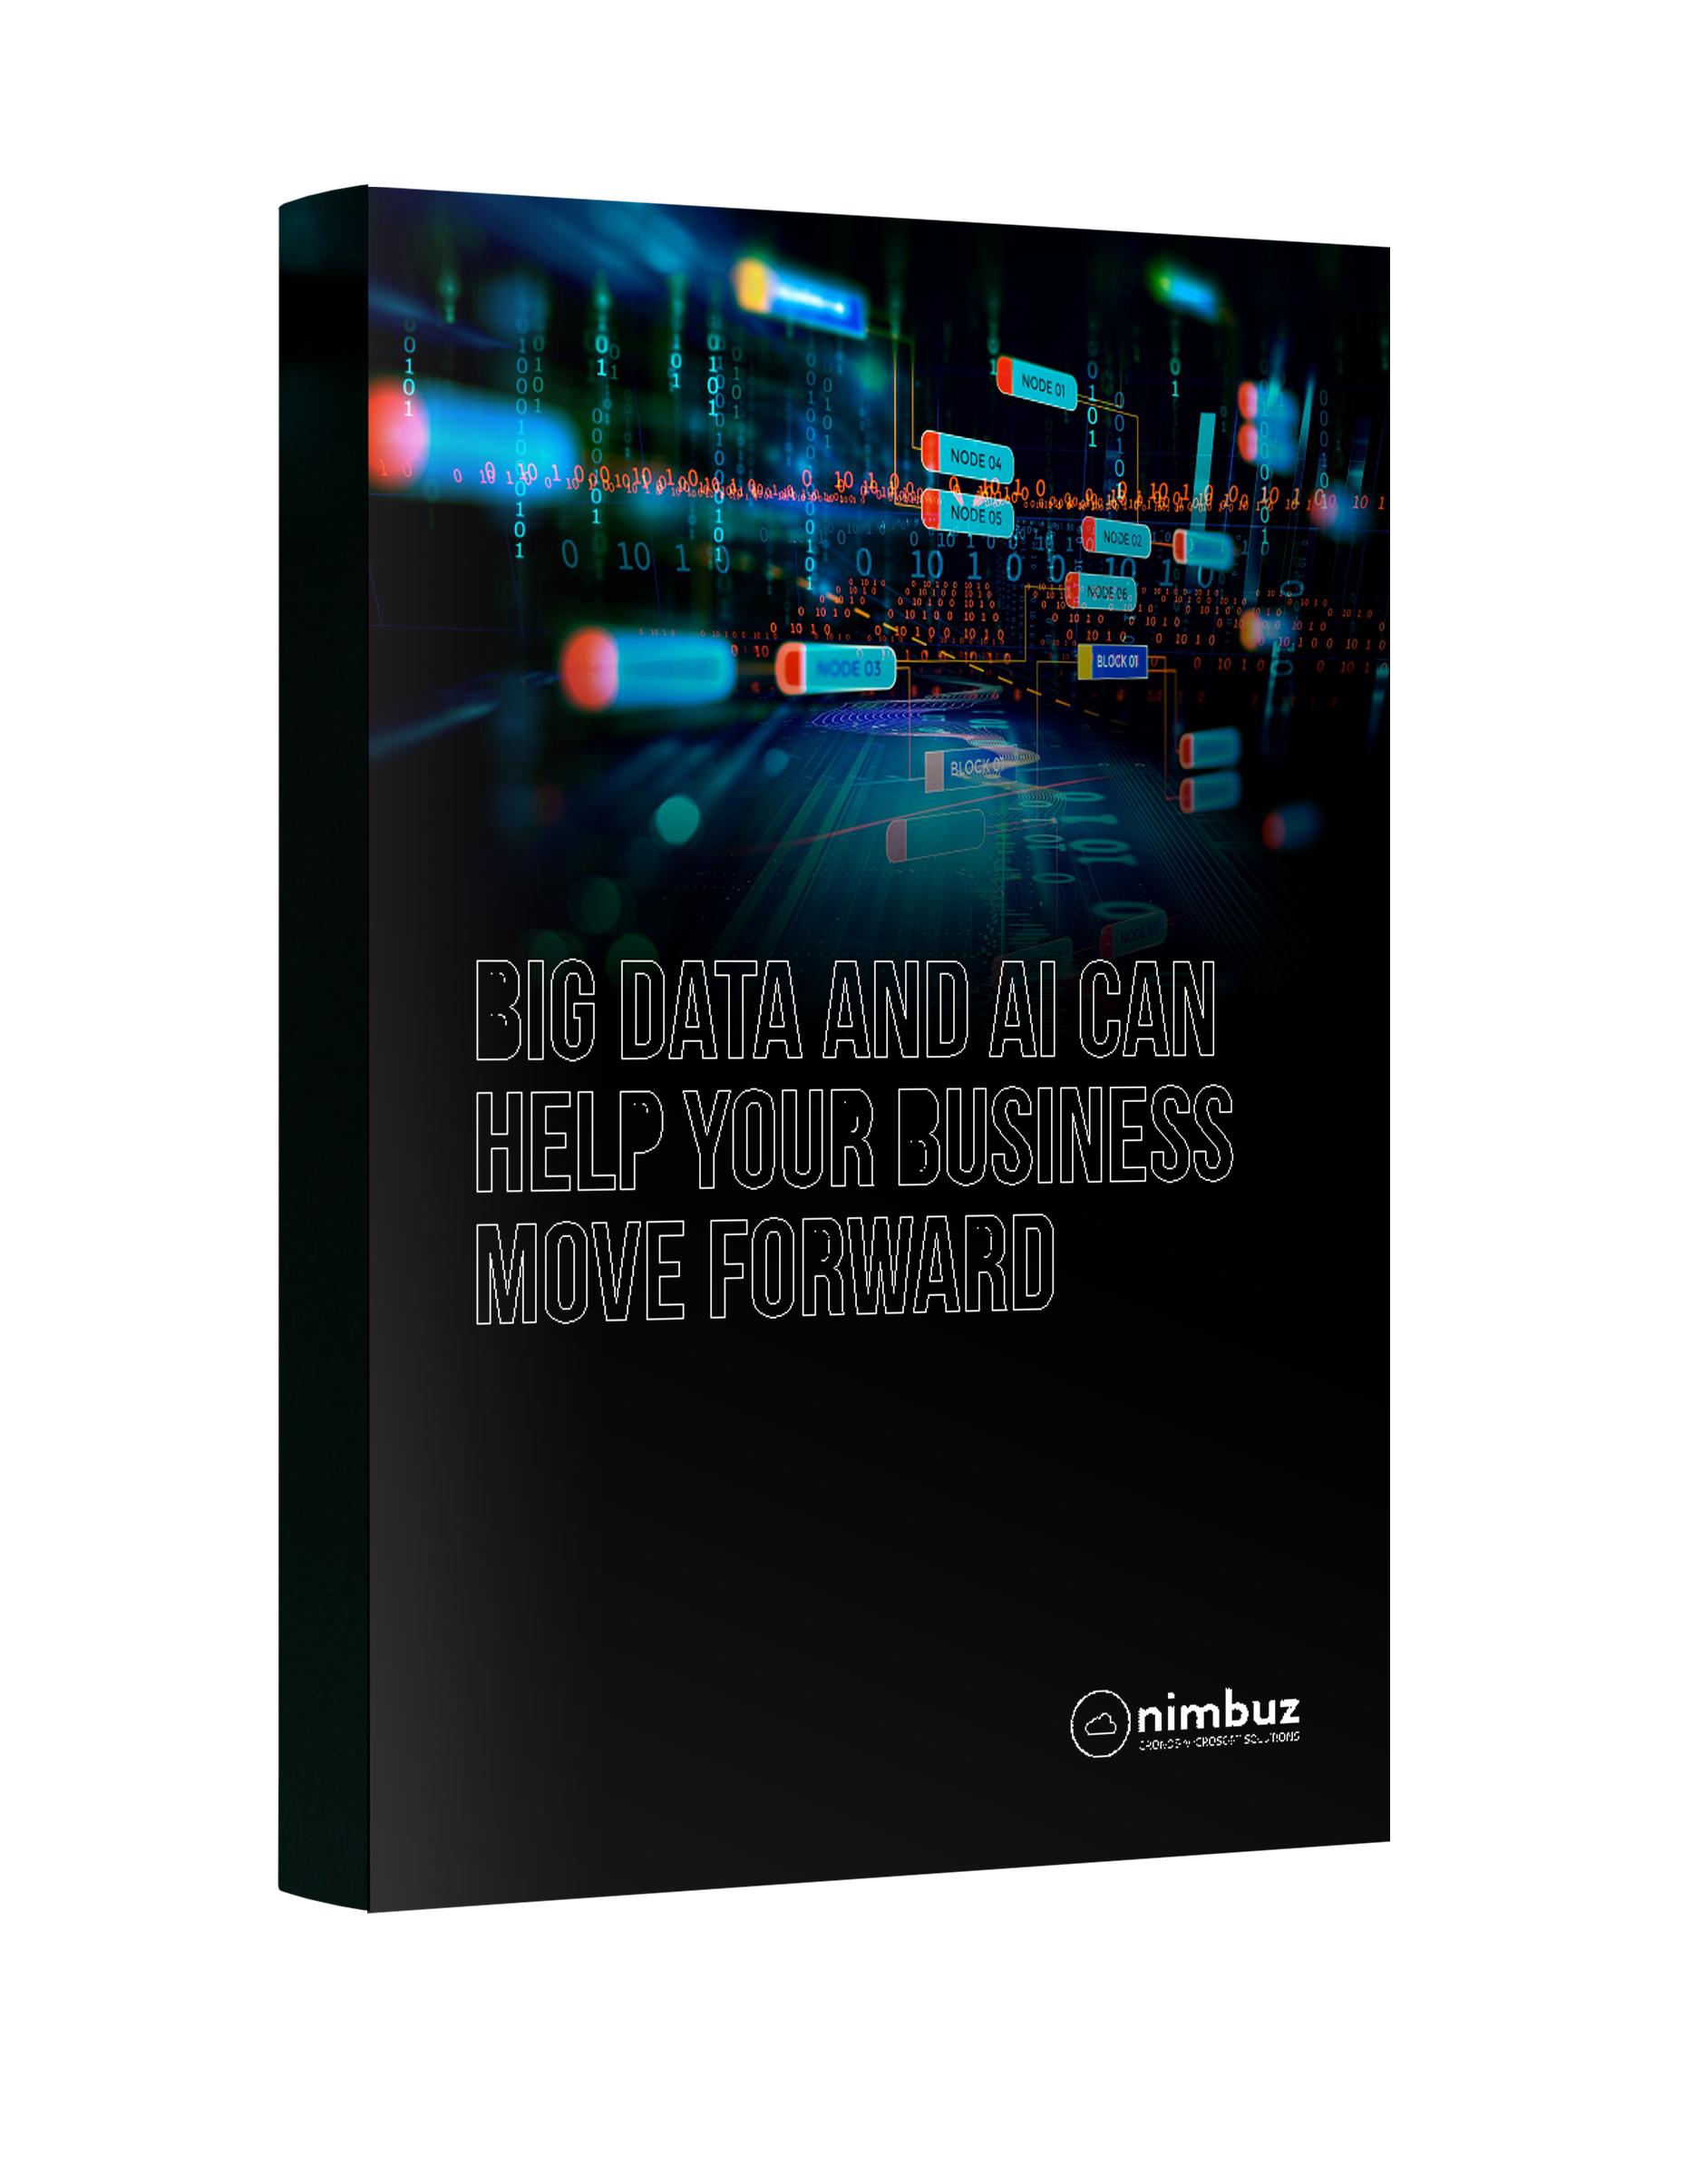 Big Data -> download now